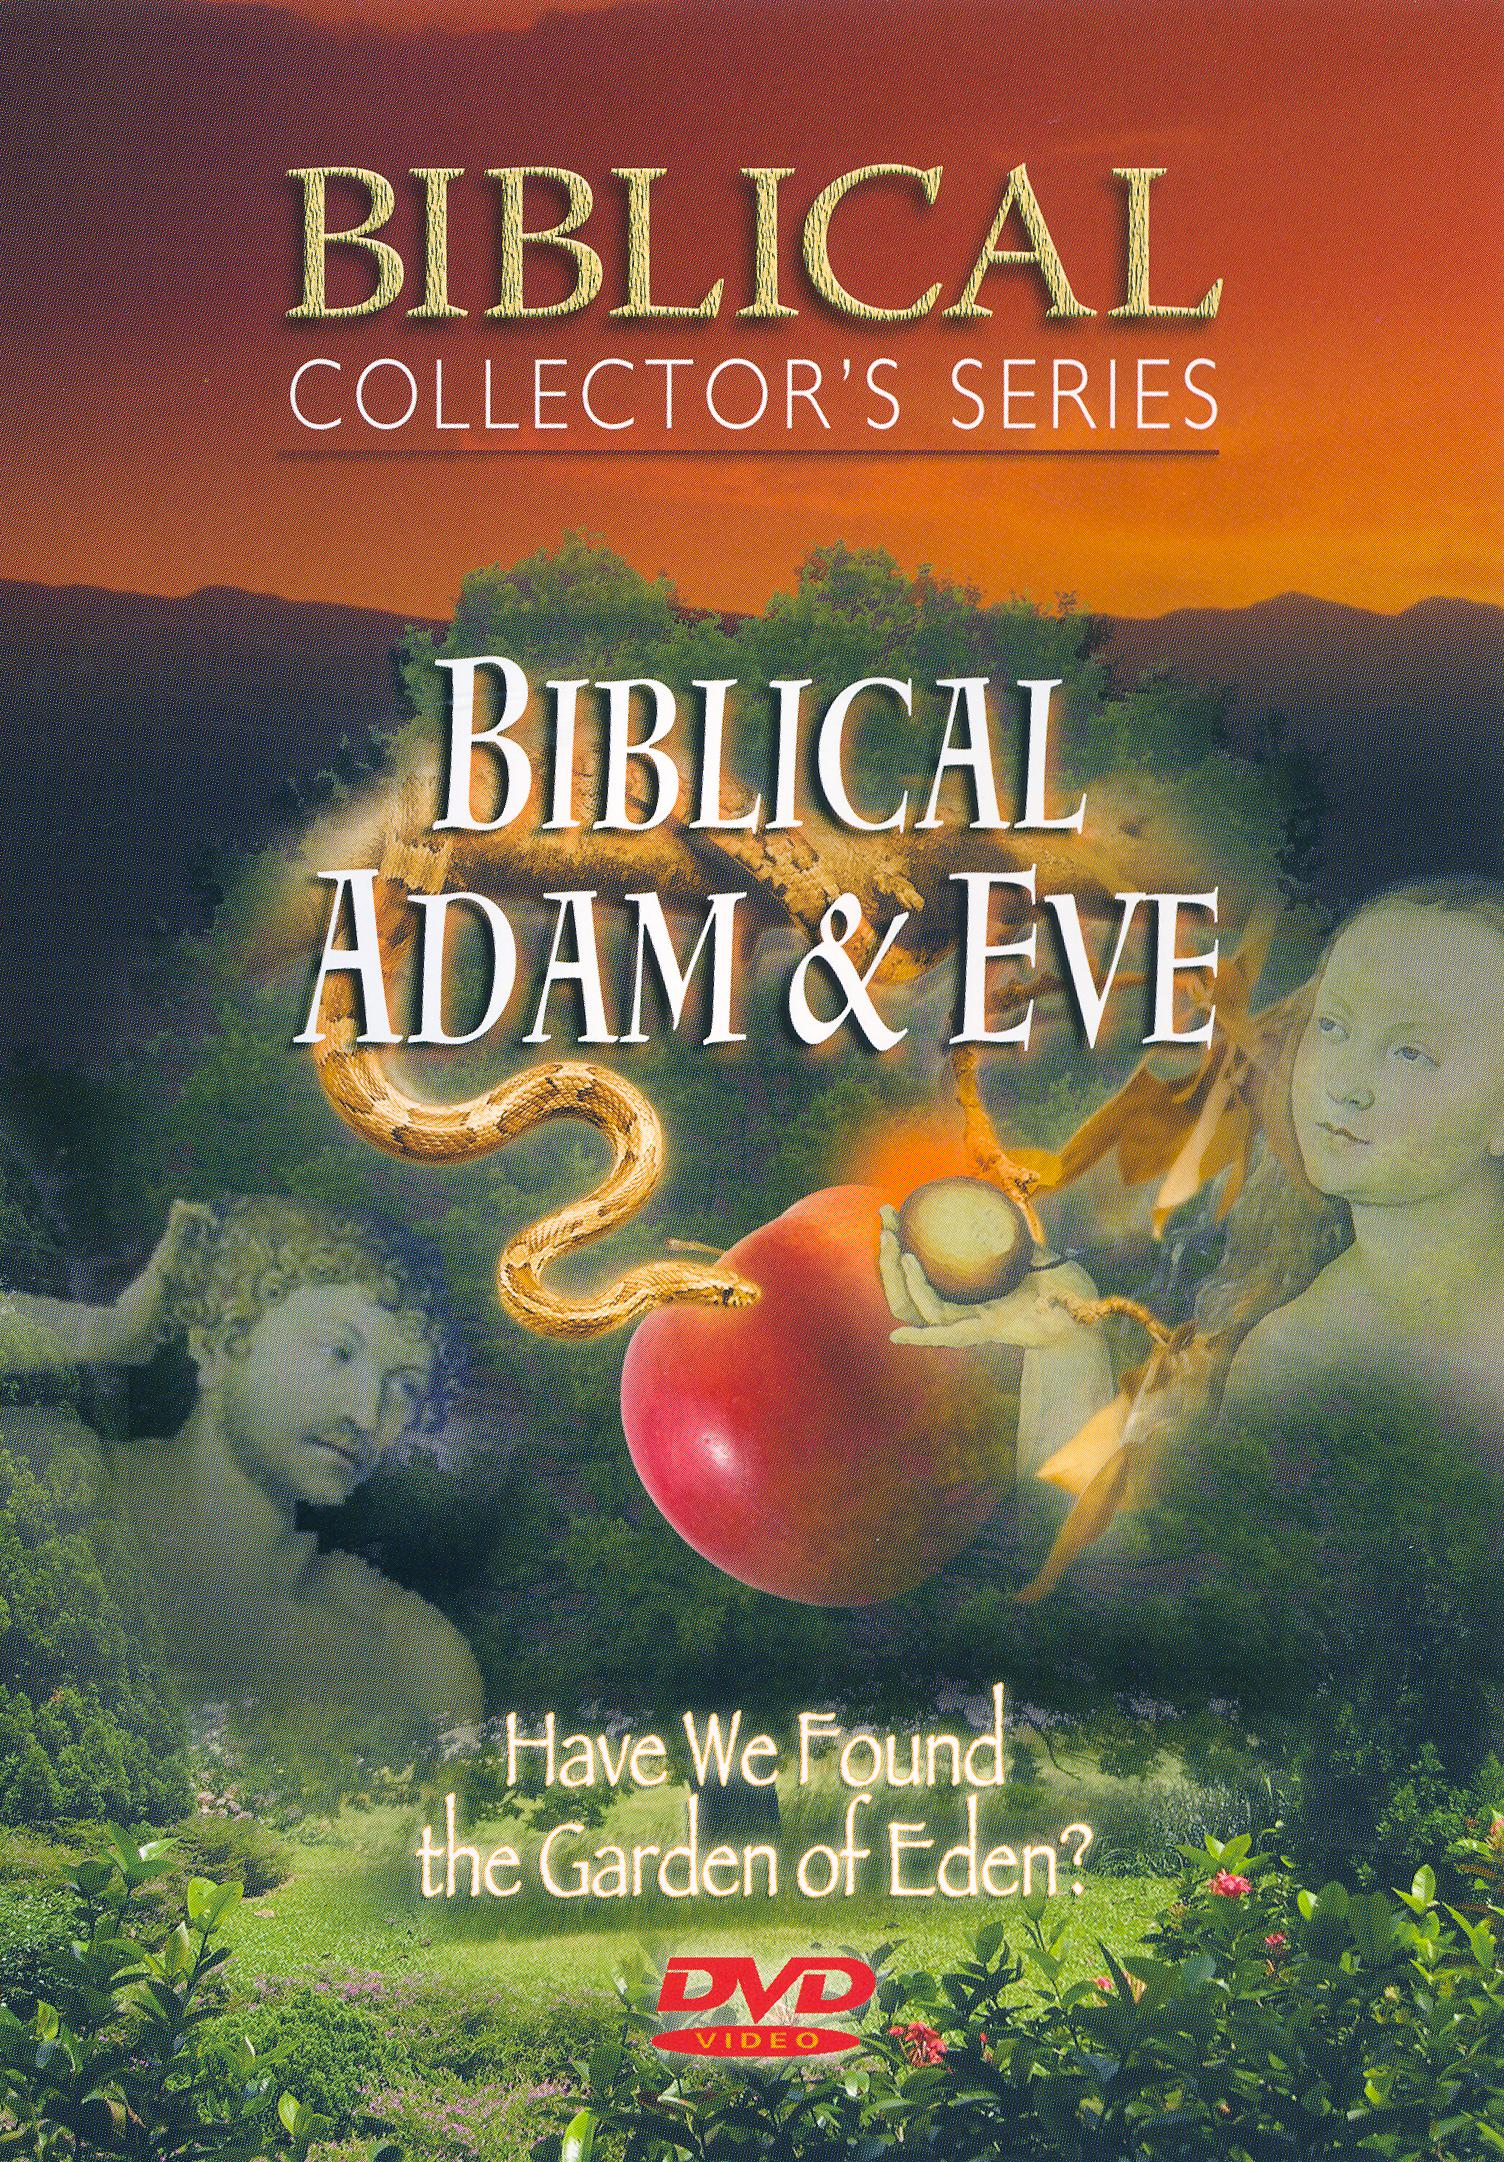 Biblical Collector's Series: Biblical Adam & Eve